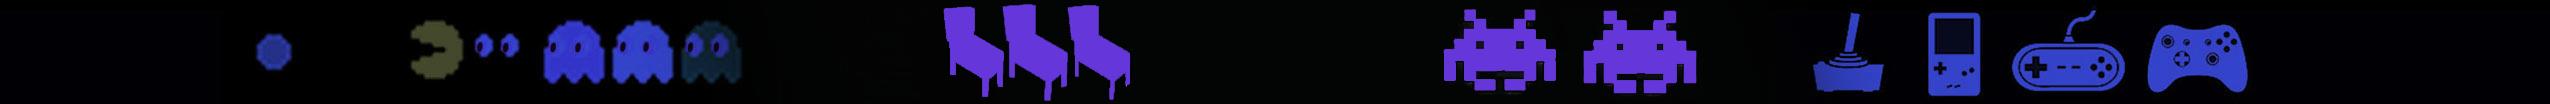 ReplayFX-HorizontalRule